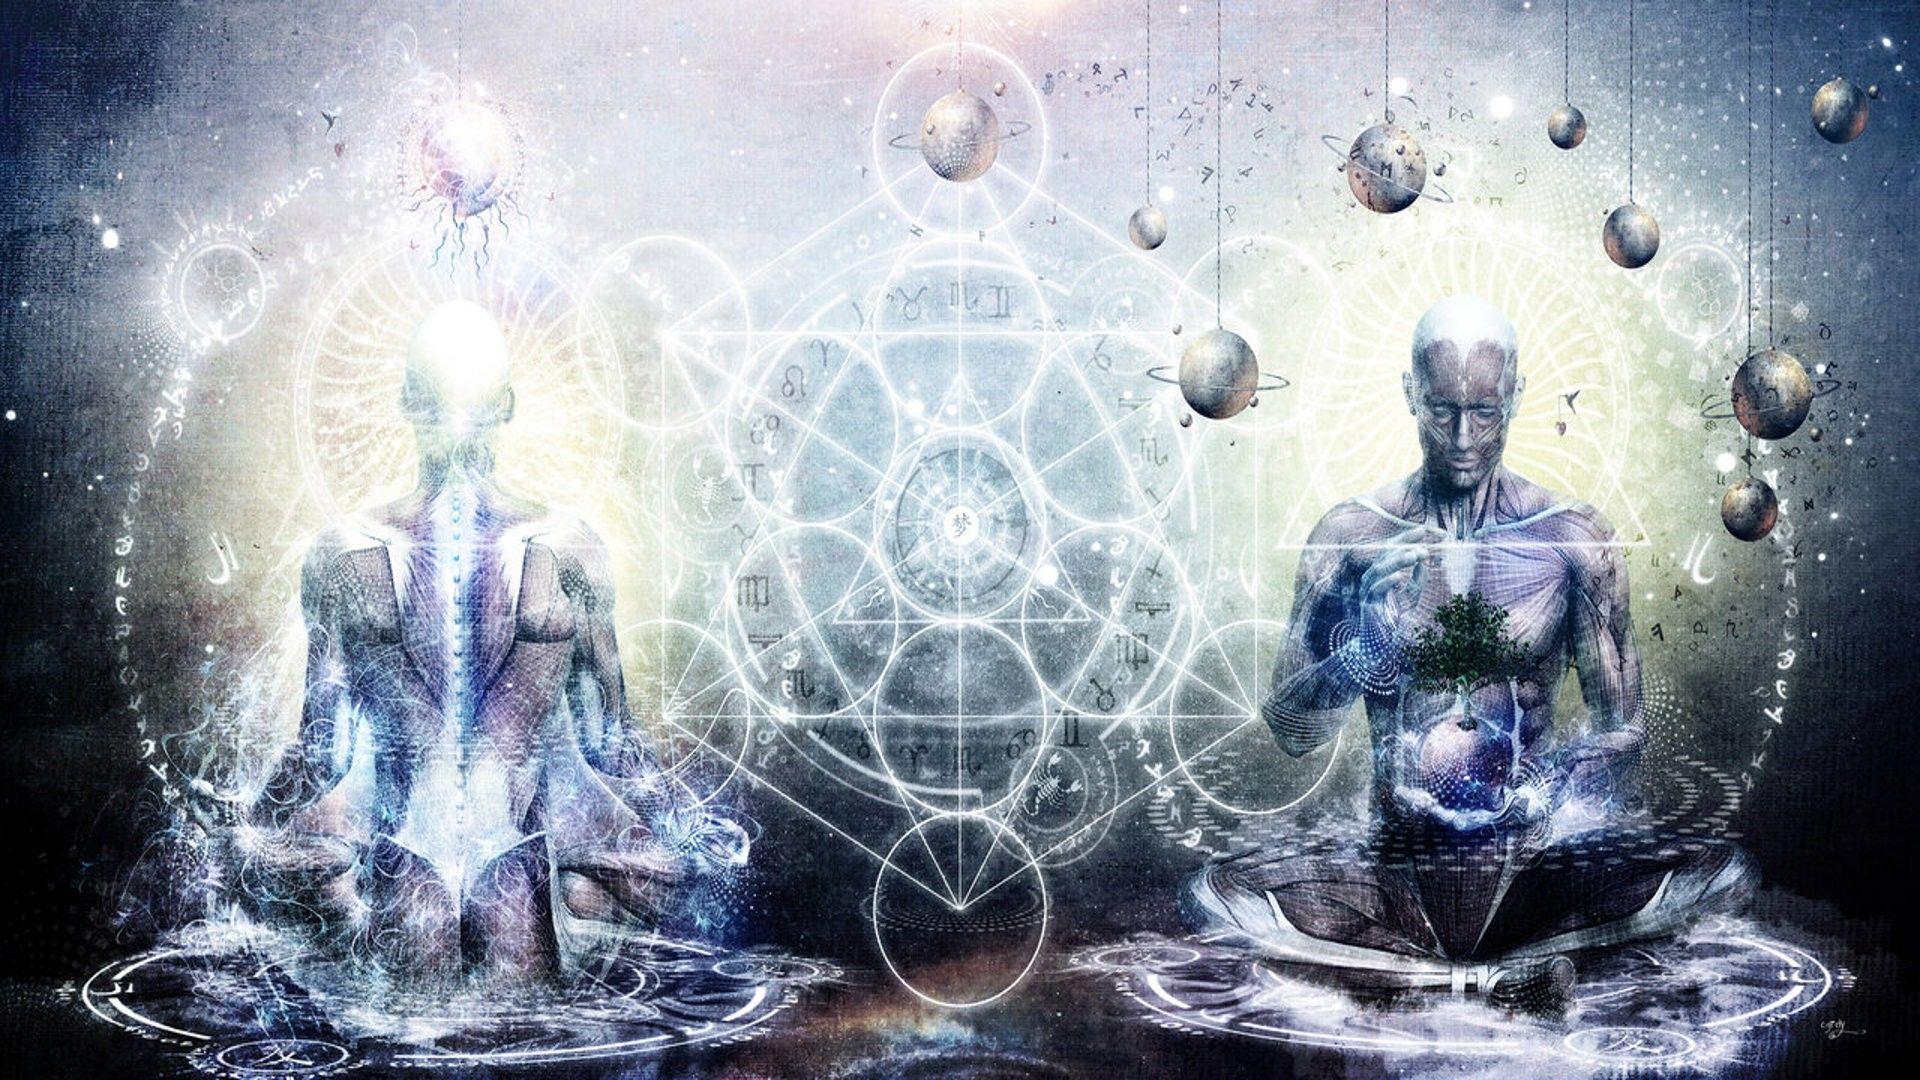 Meditation Wallpapers Buddhist Art Visionary Art Cameron Gray